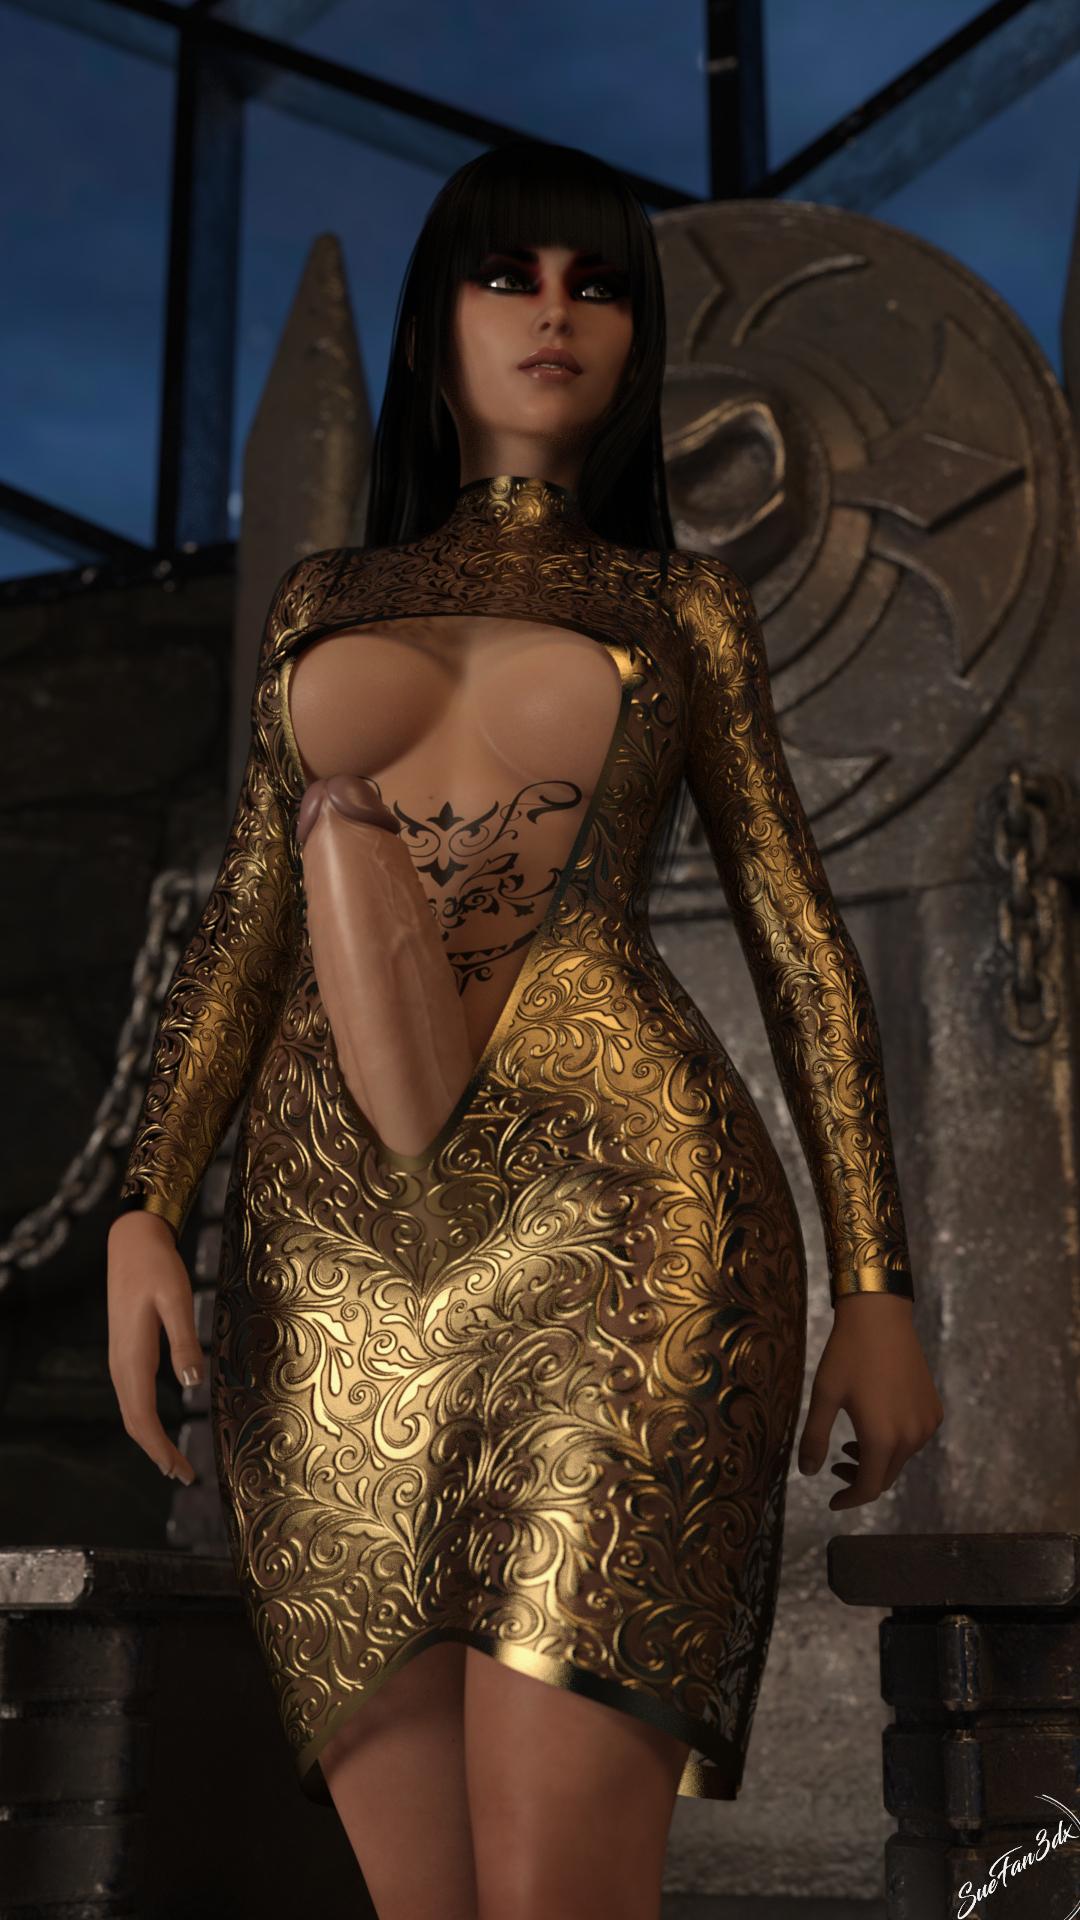 Mia in a dress